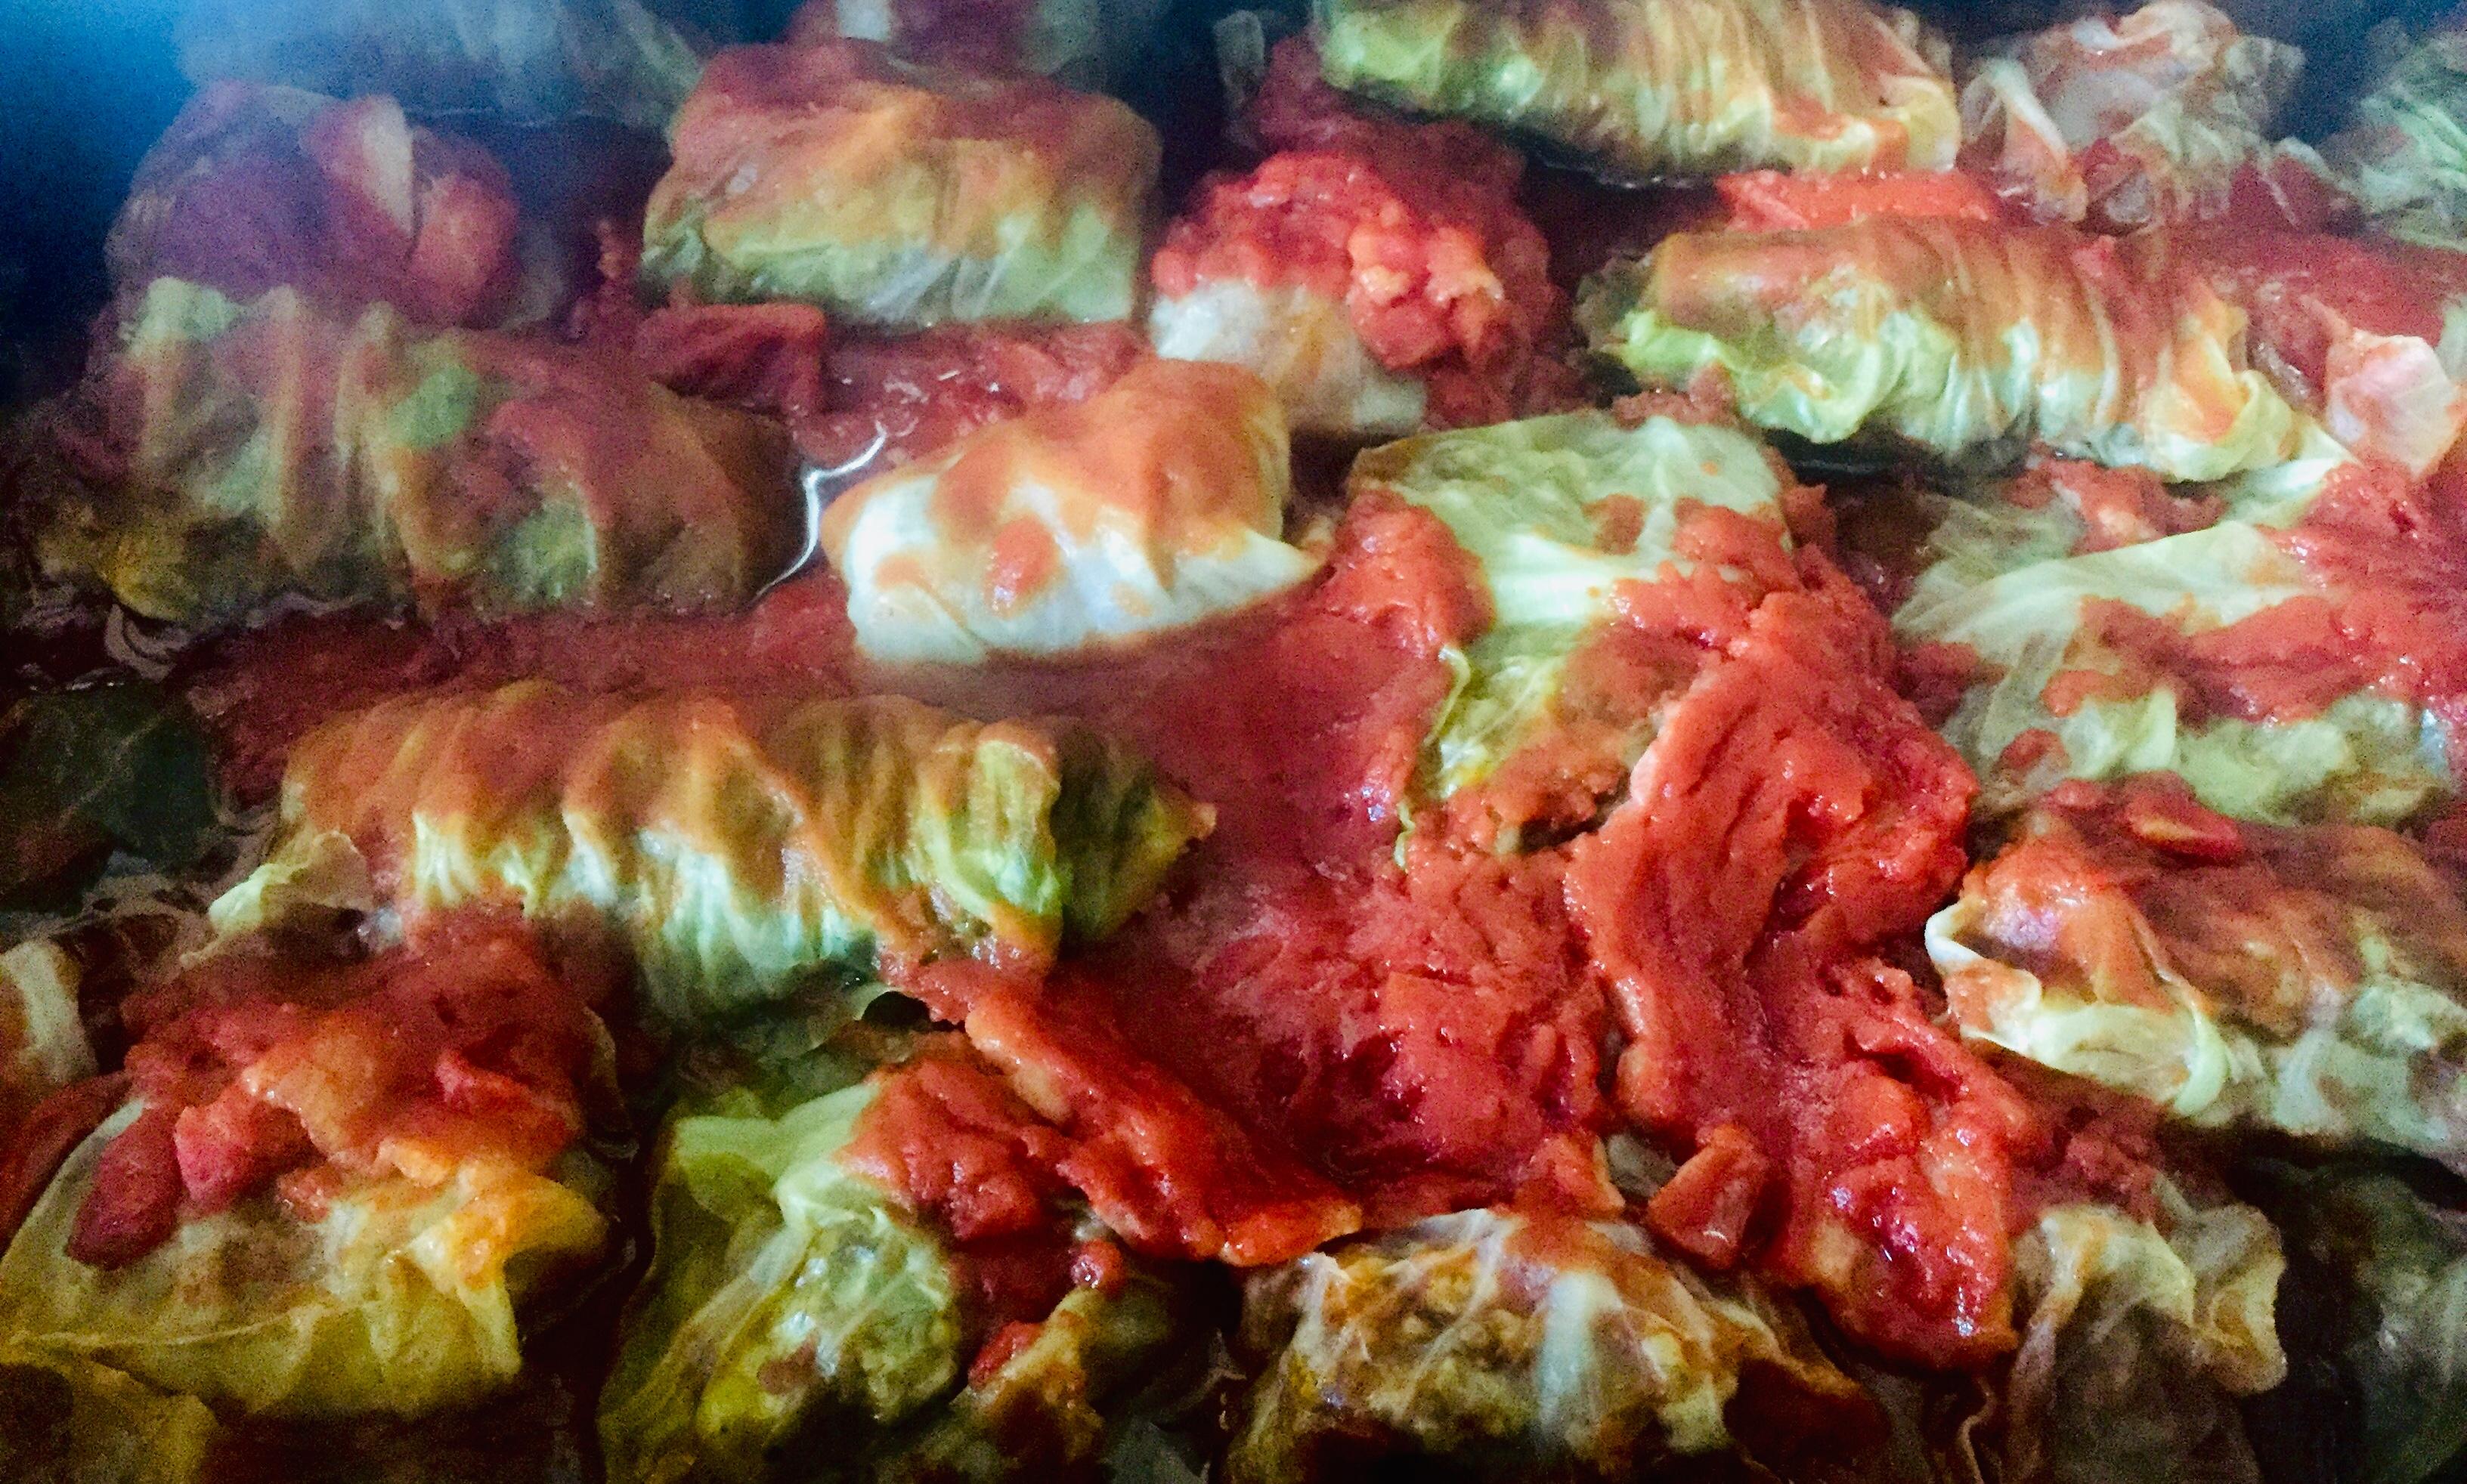 Golabki (Stuffed Cabbage Rolls)